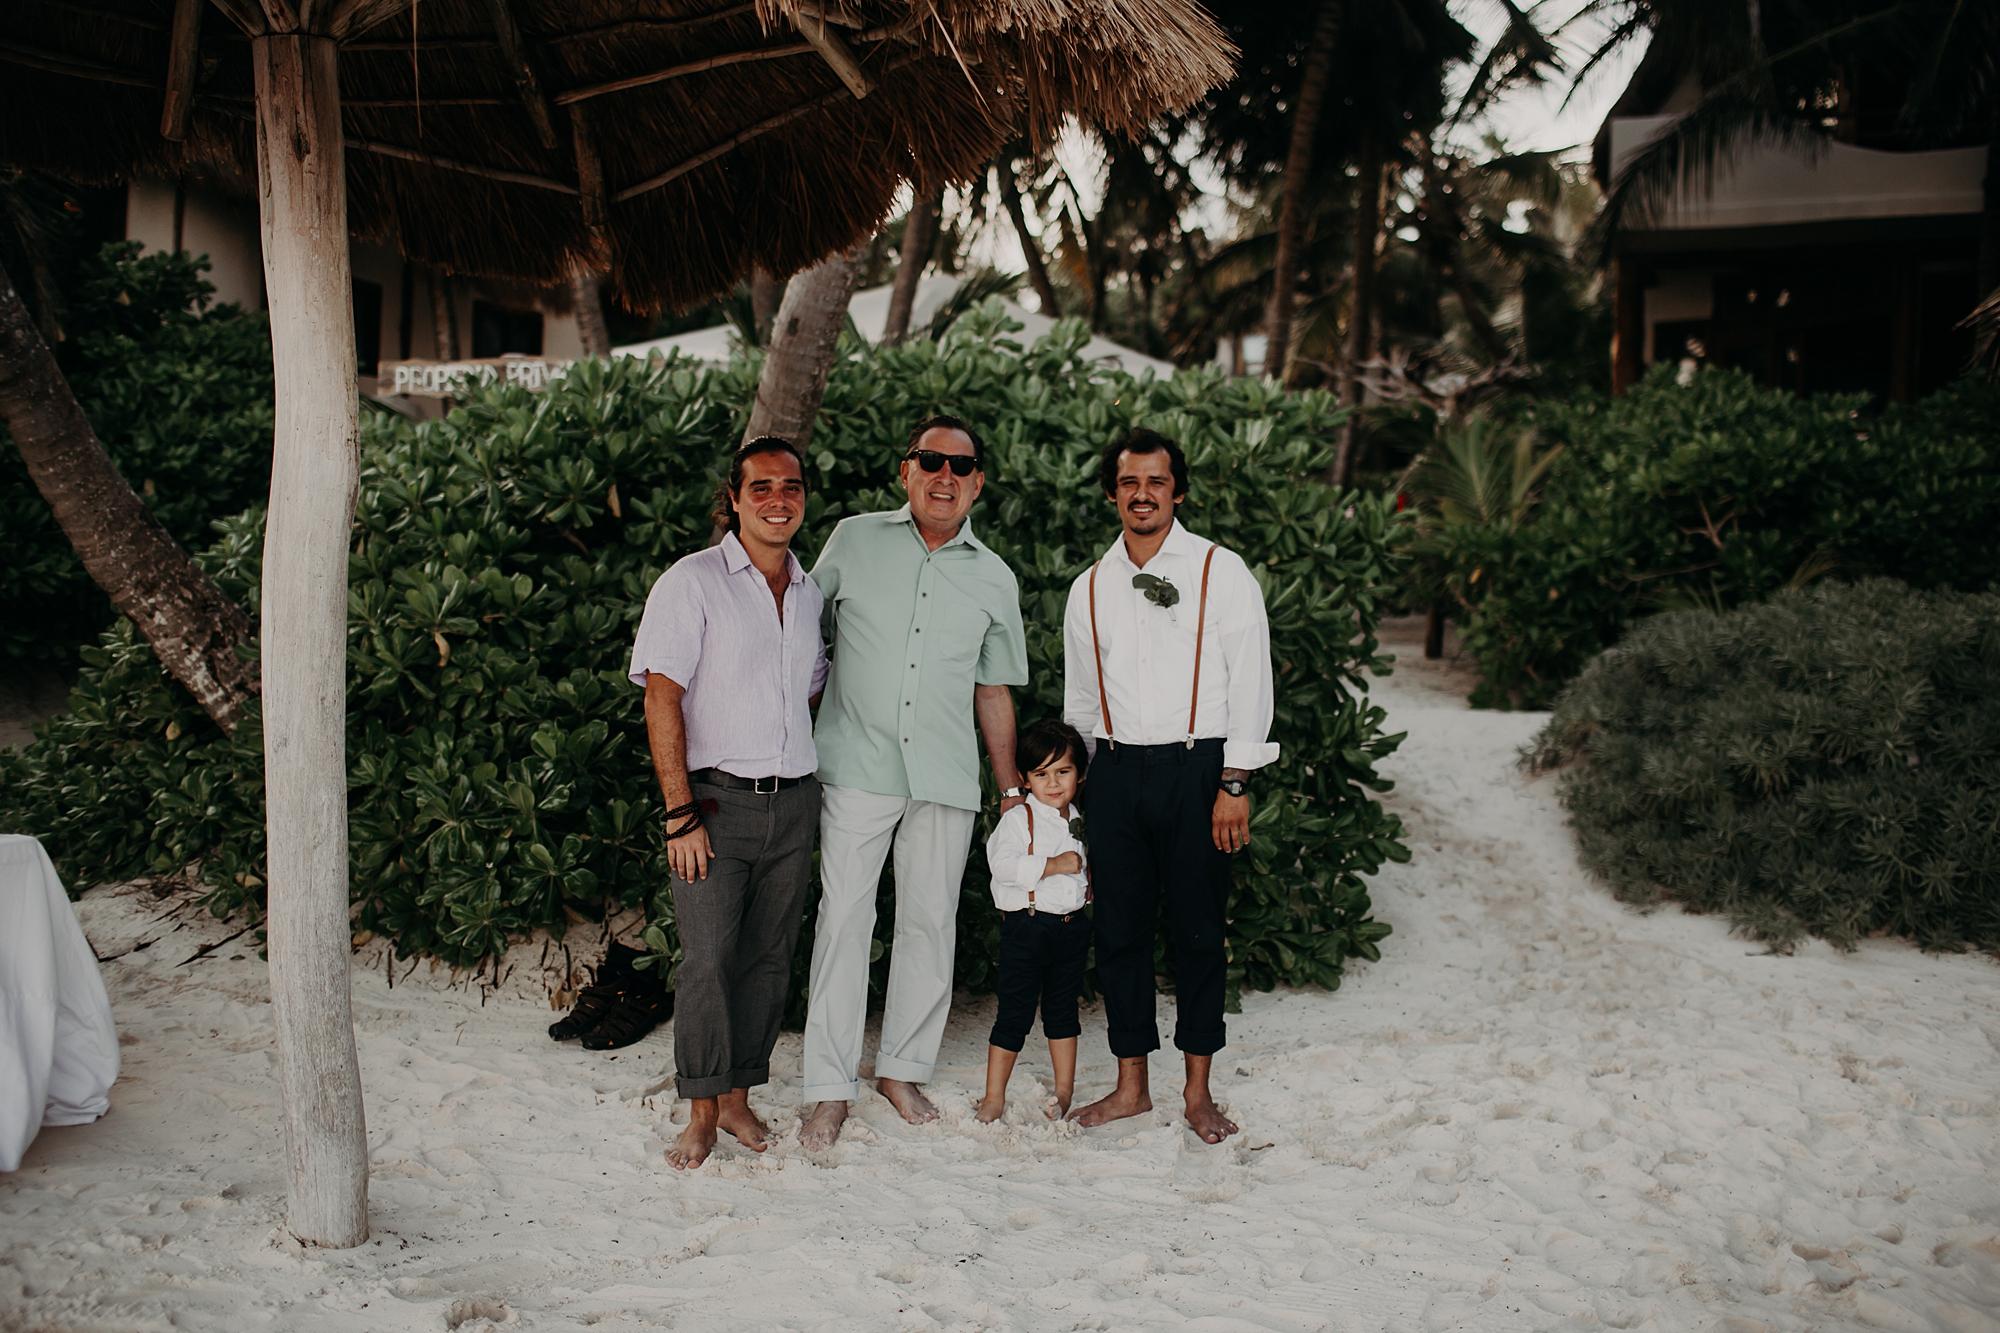 Danielle-San-Antonio-Wedding-Photographer-111_WEB.jpg